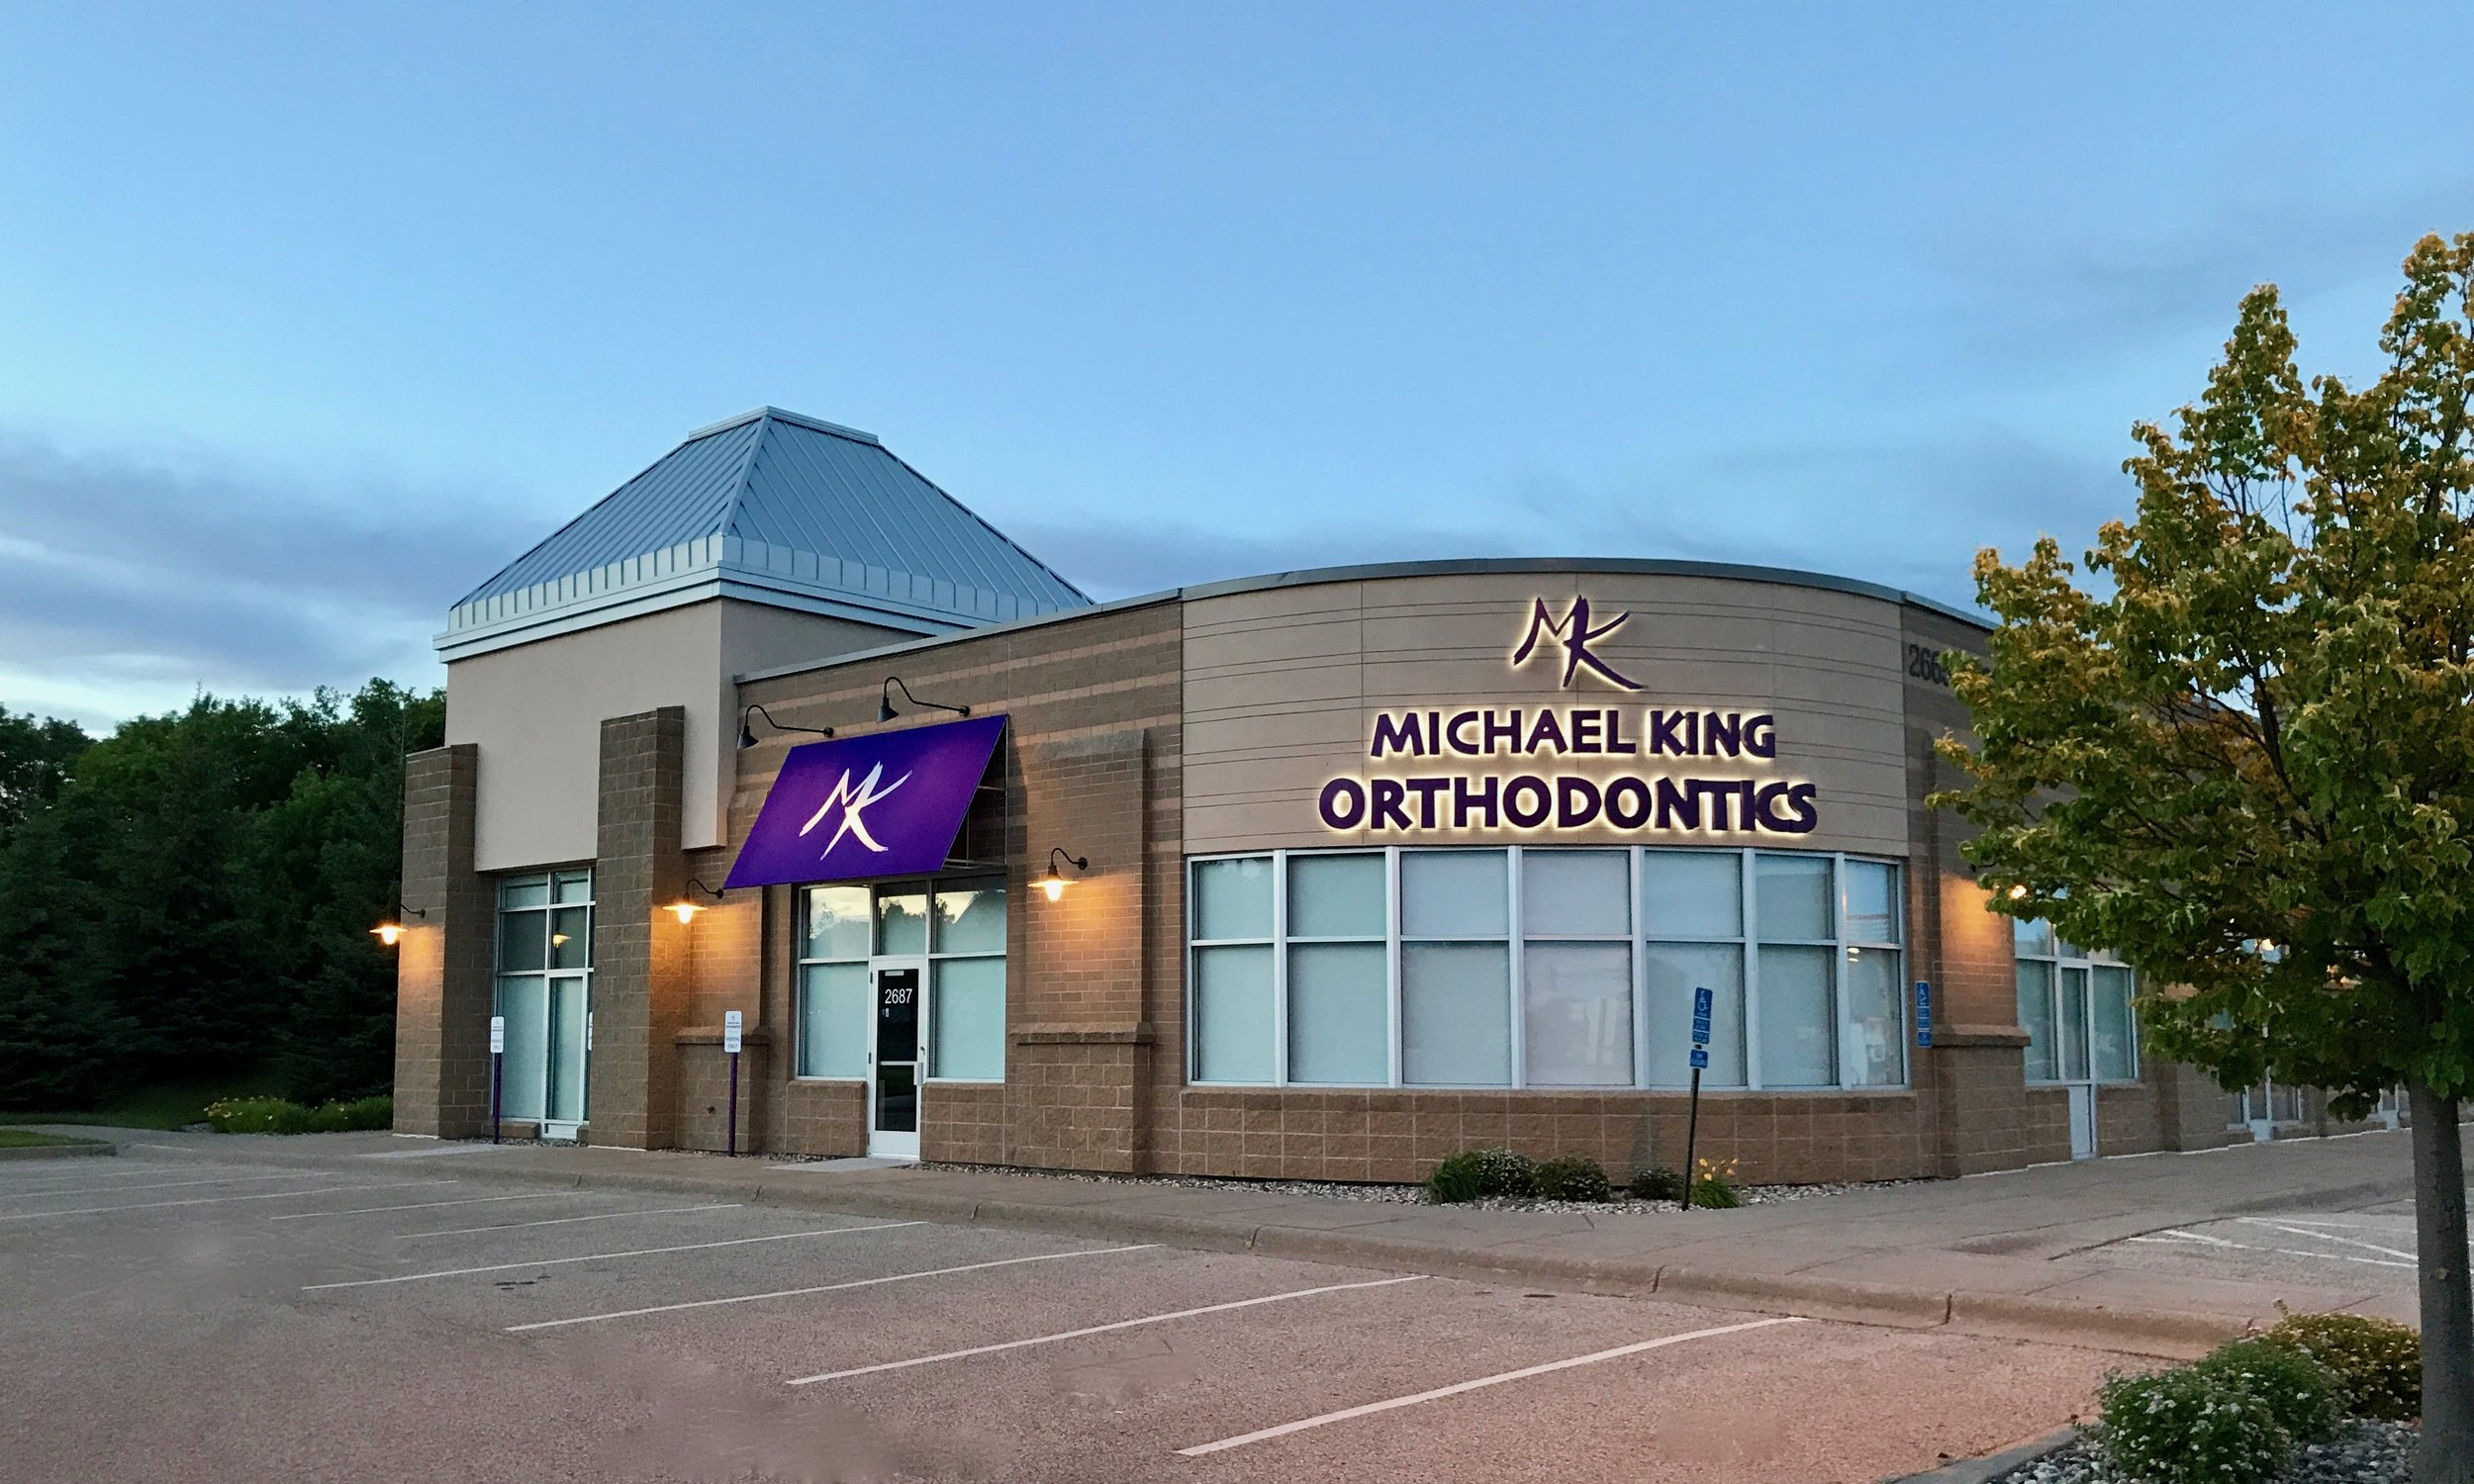 Michael King Orthodontics - Exterior Photo